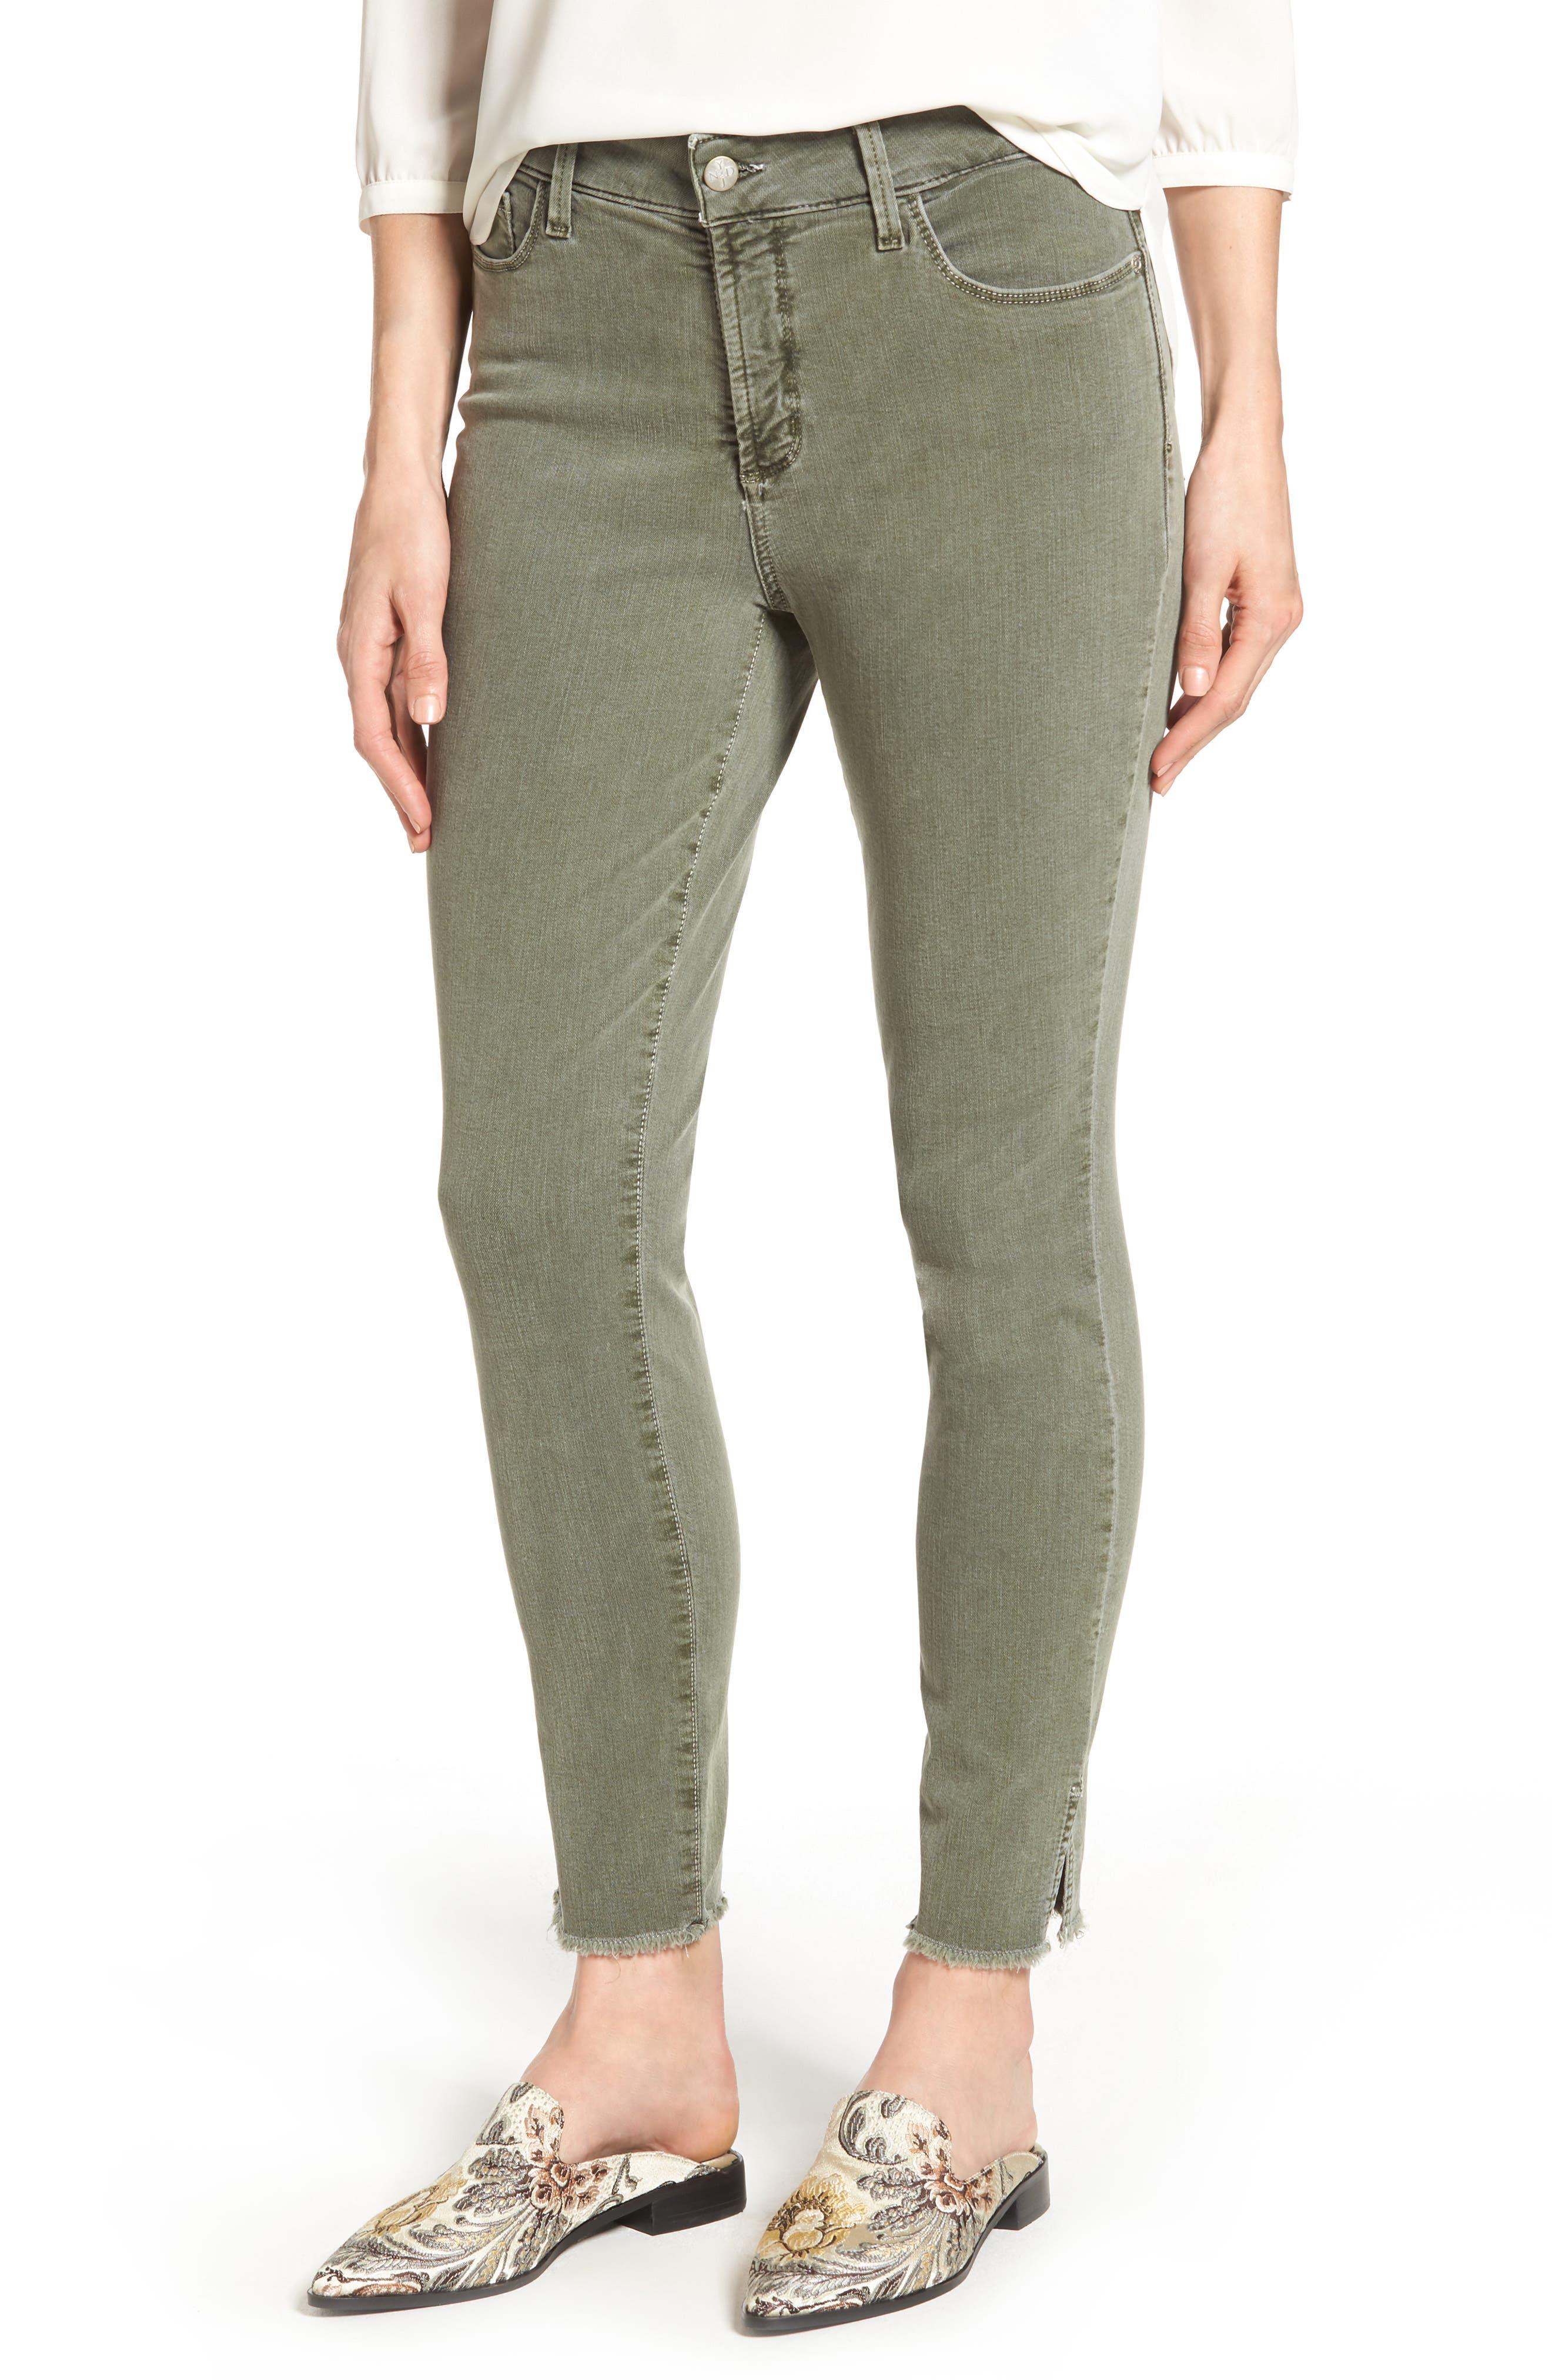 Main Image - NYDJ Ami Frayed Hem Stretch Skinny Ankle Jeans (Regular & Petite)